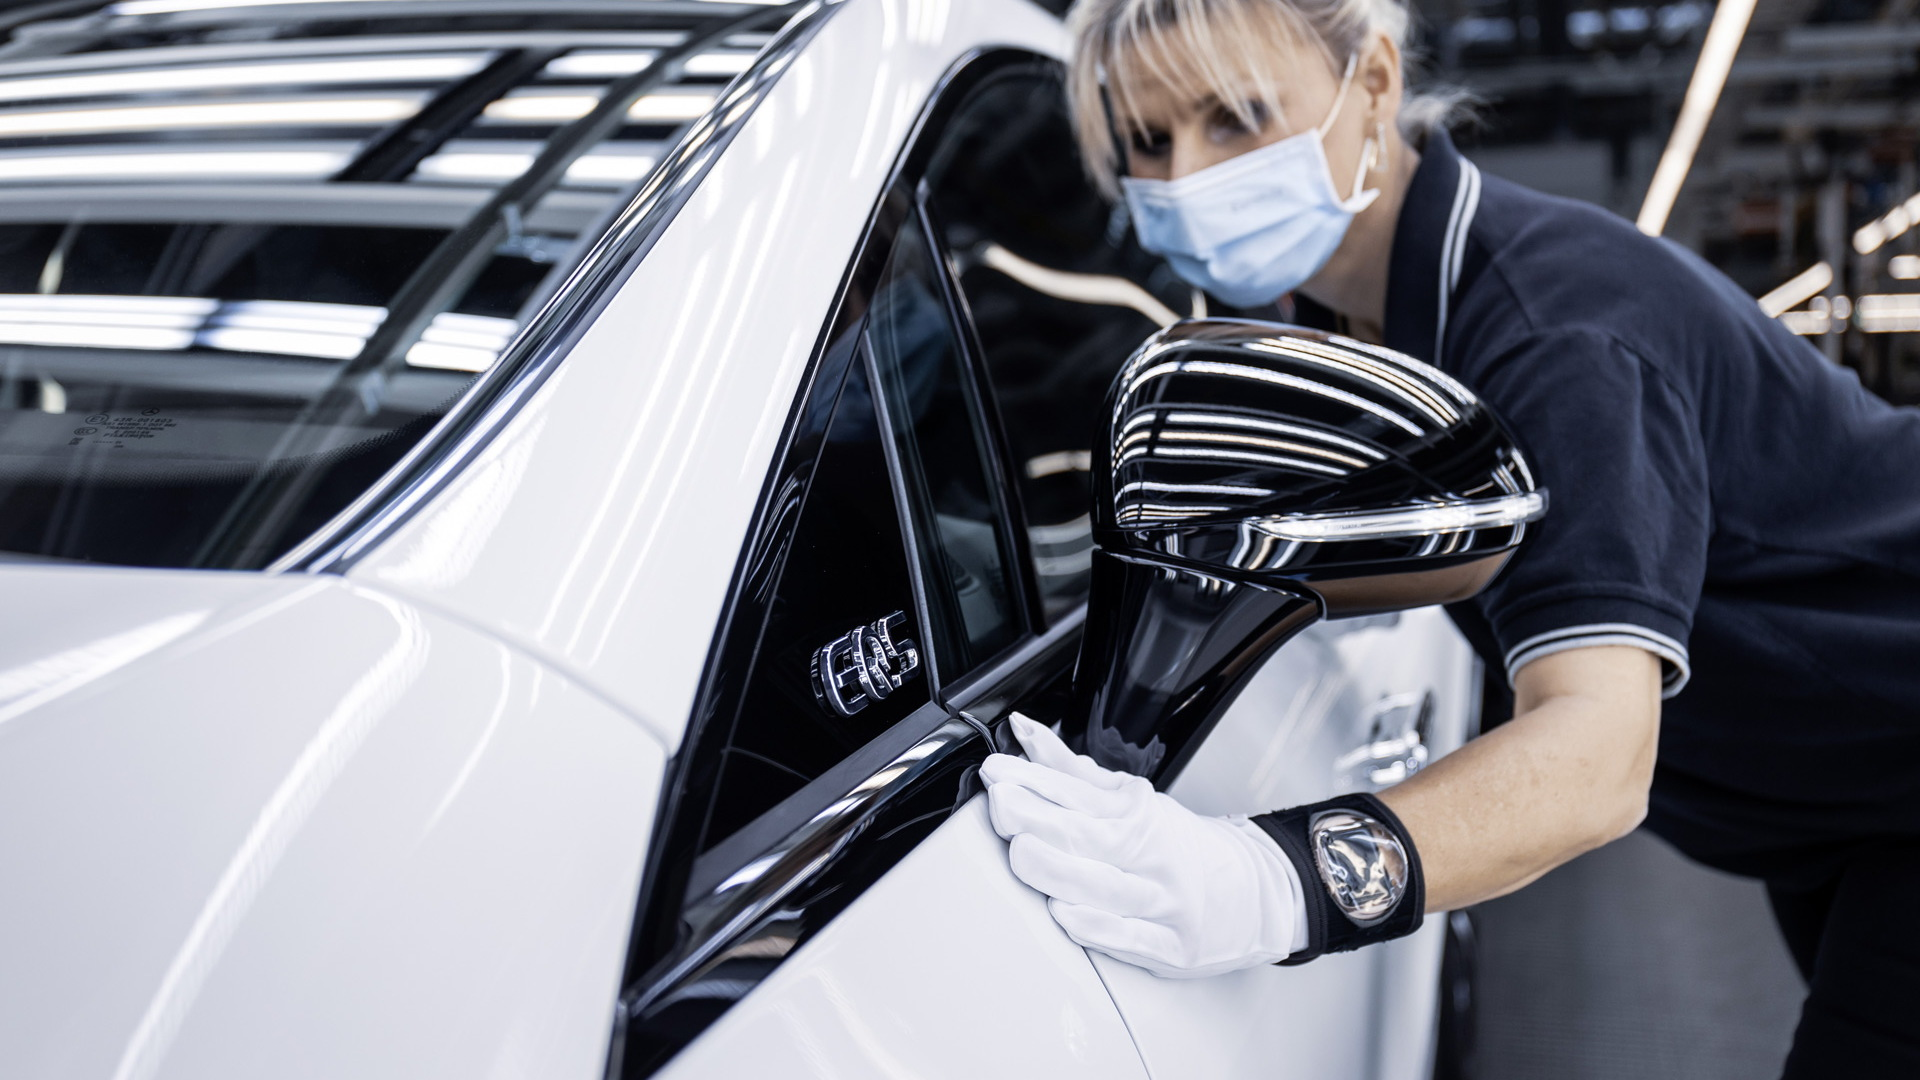 2022 Mercedes-Benz EQS production at plant in Sindelfingen, Germany